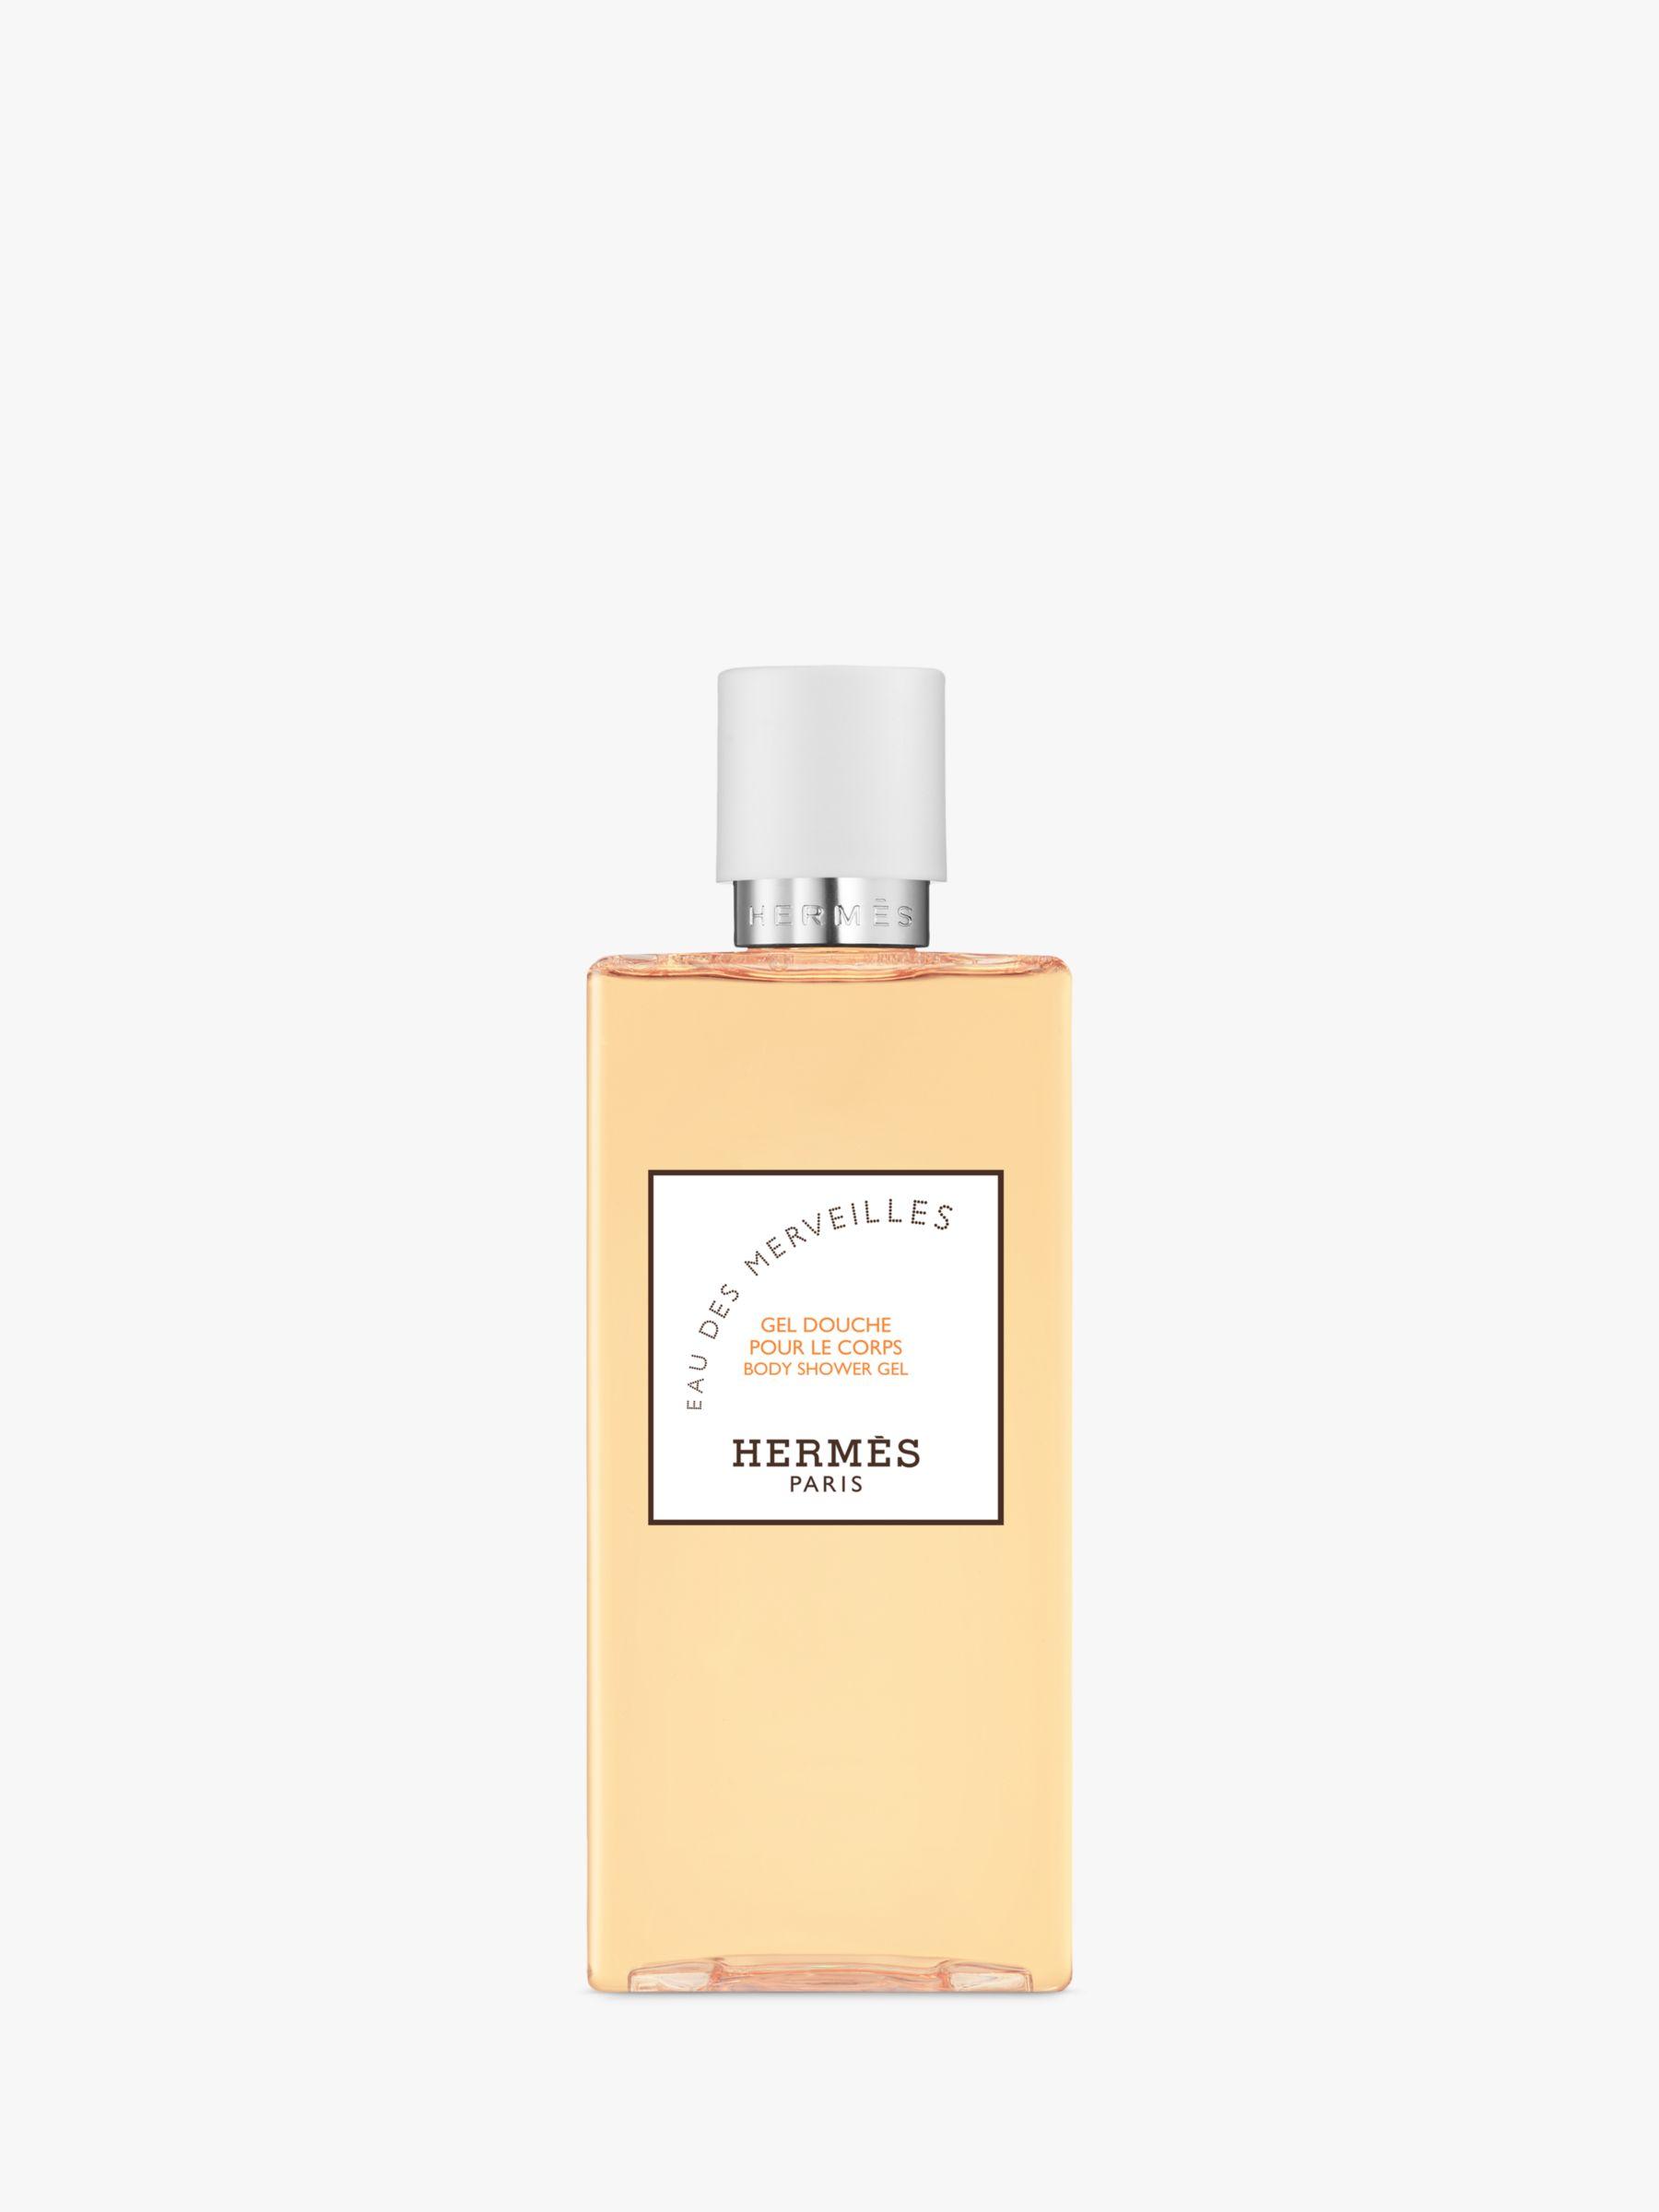 Hermes HERMÈS Eau Des Merveilles Body Shower Gel, 200ml